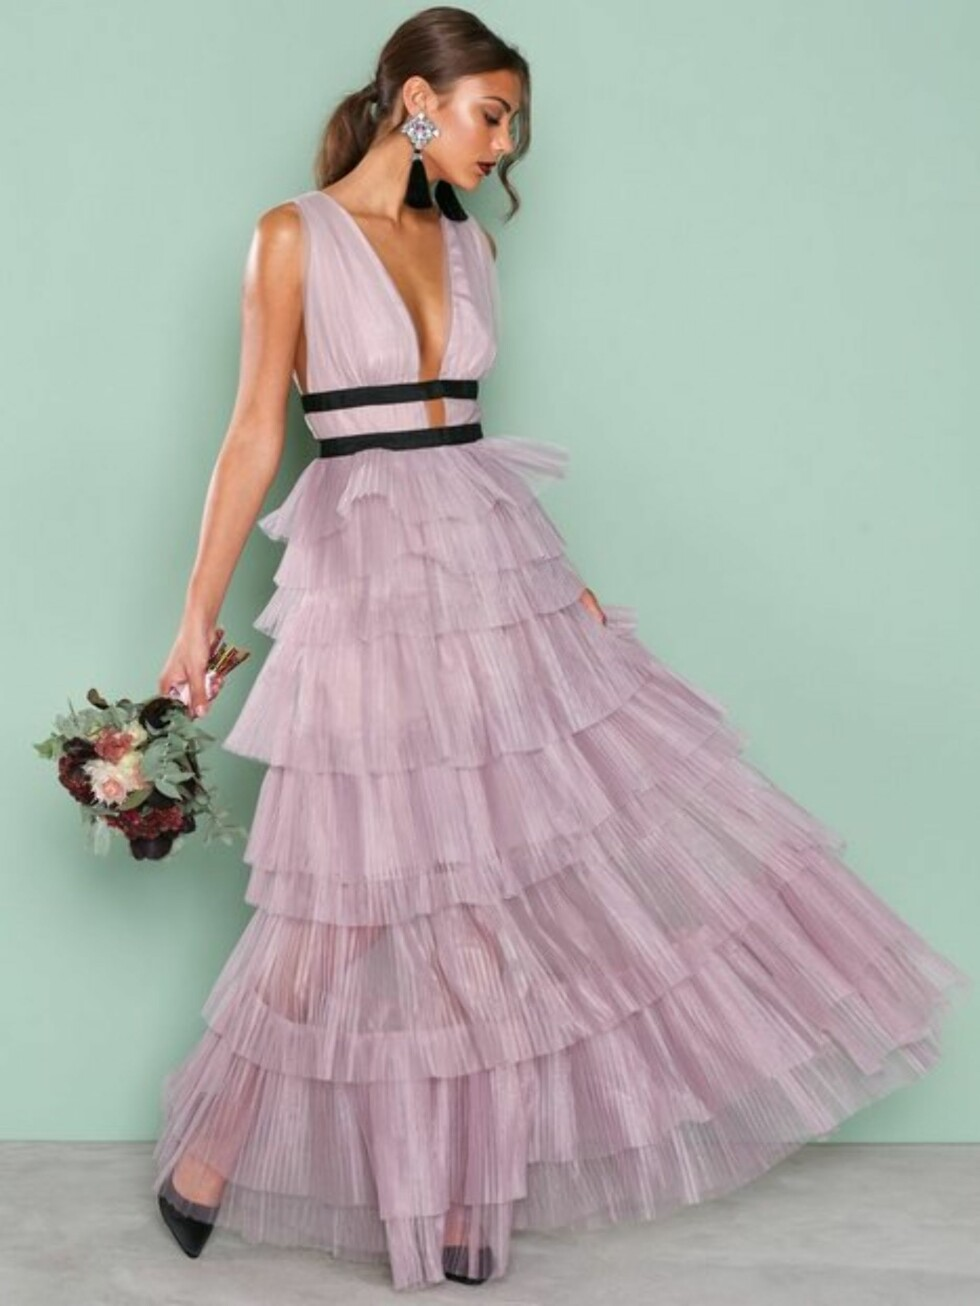 Kjole fra True Decadence |1399,-| https://nelly.com/no/kl%C3%A6r-til-kvinner/kl%C3%A6r/festkjoler/true-decadence-201561/short-sleeve-frill-dress-738287-2449/